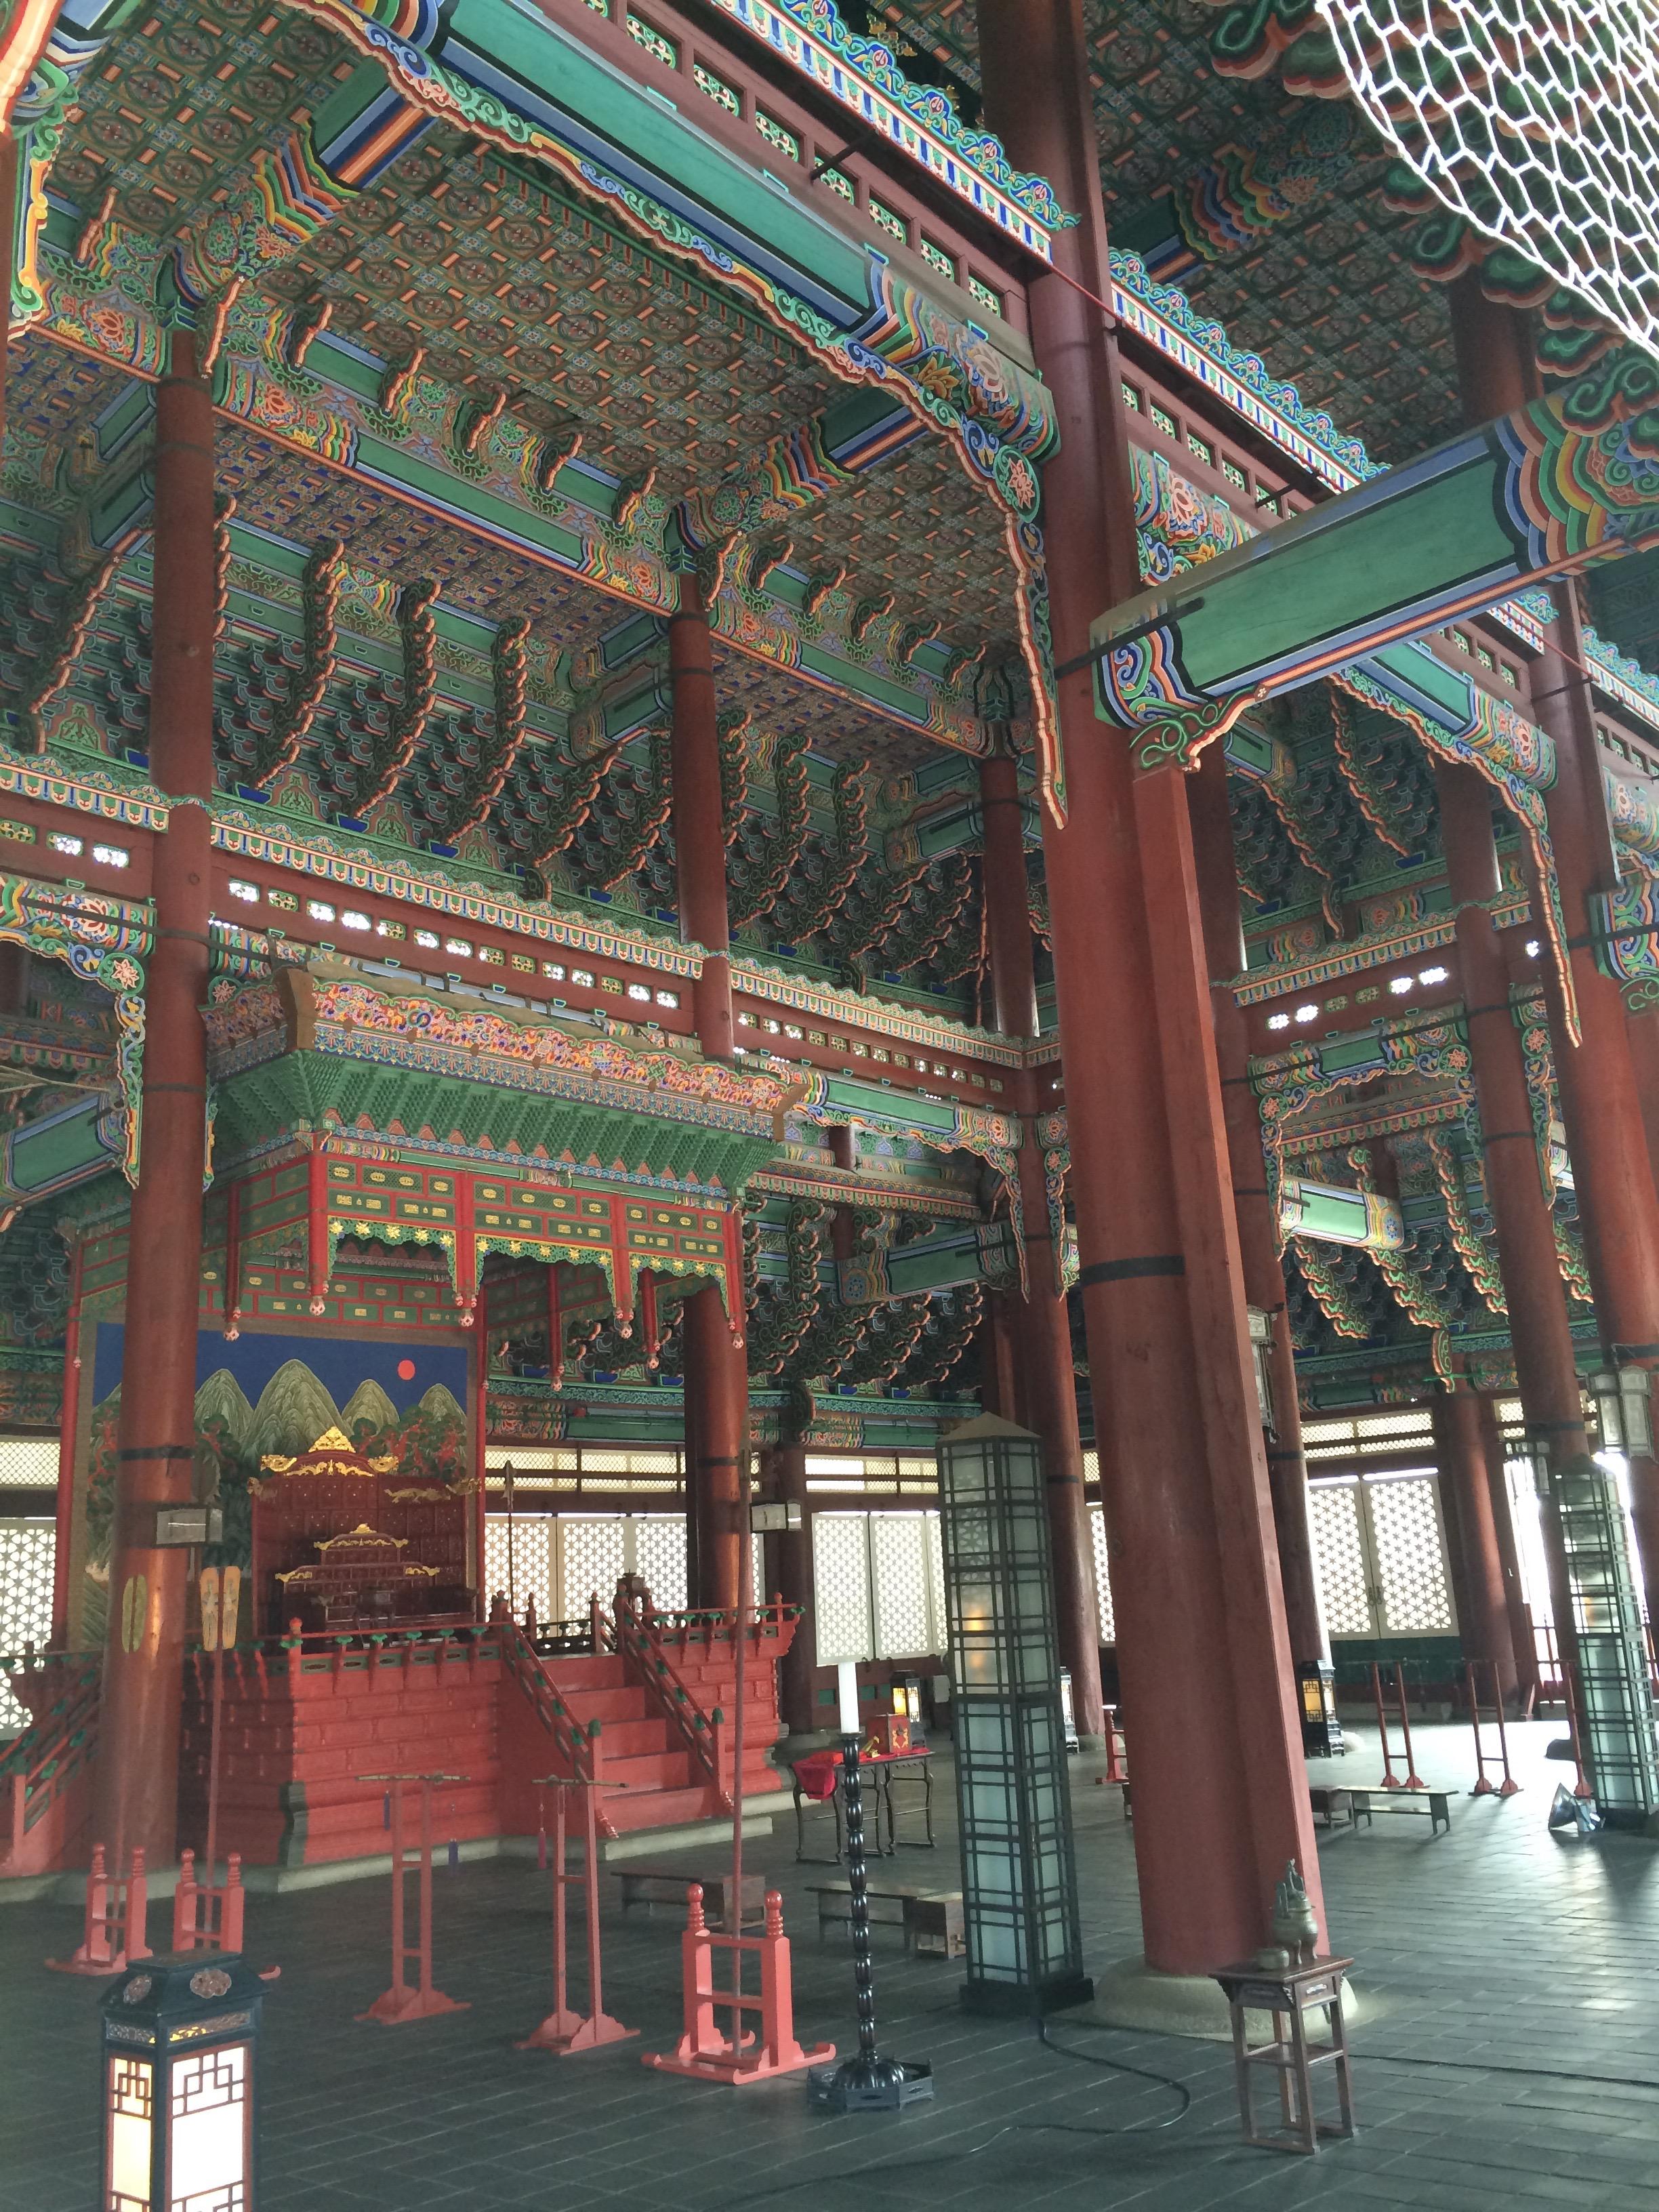 InsideGyeongbokgung Palace